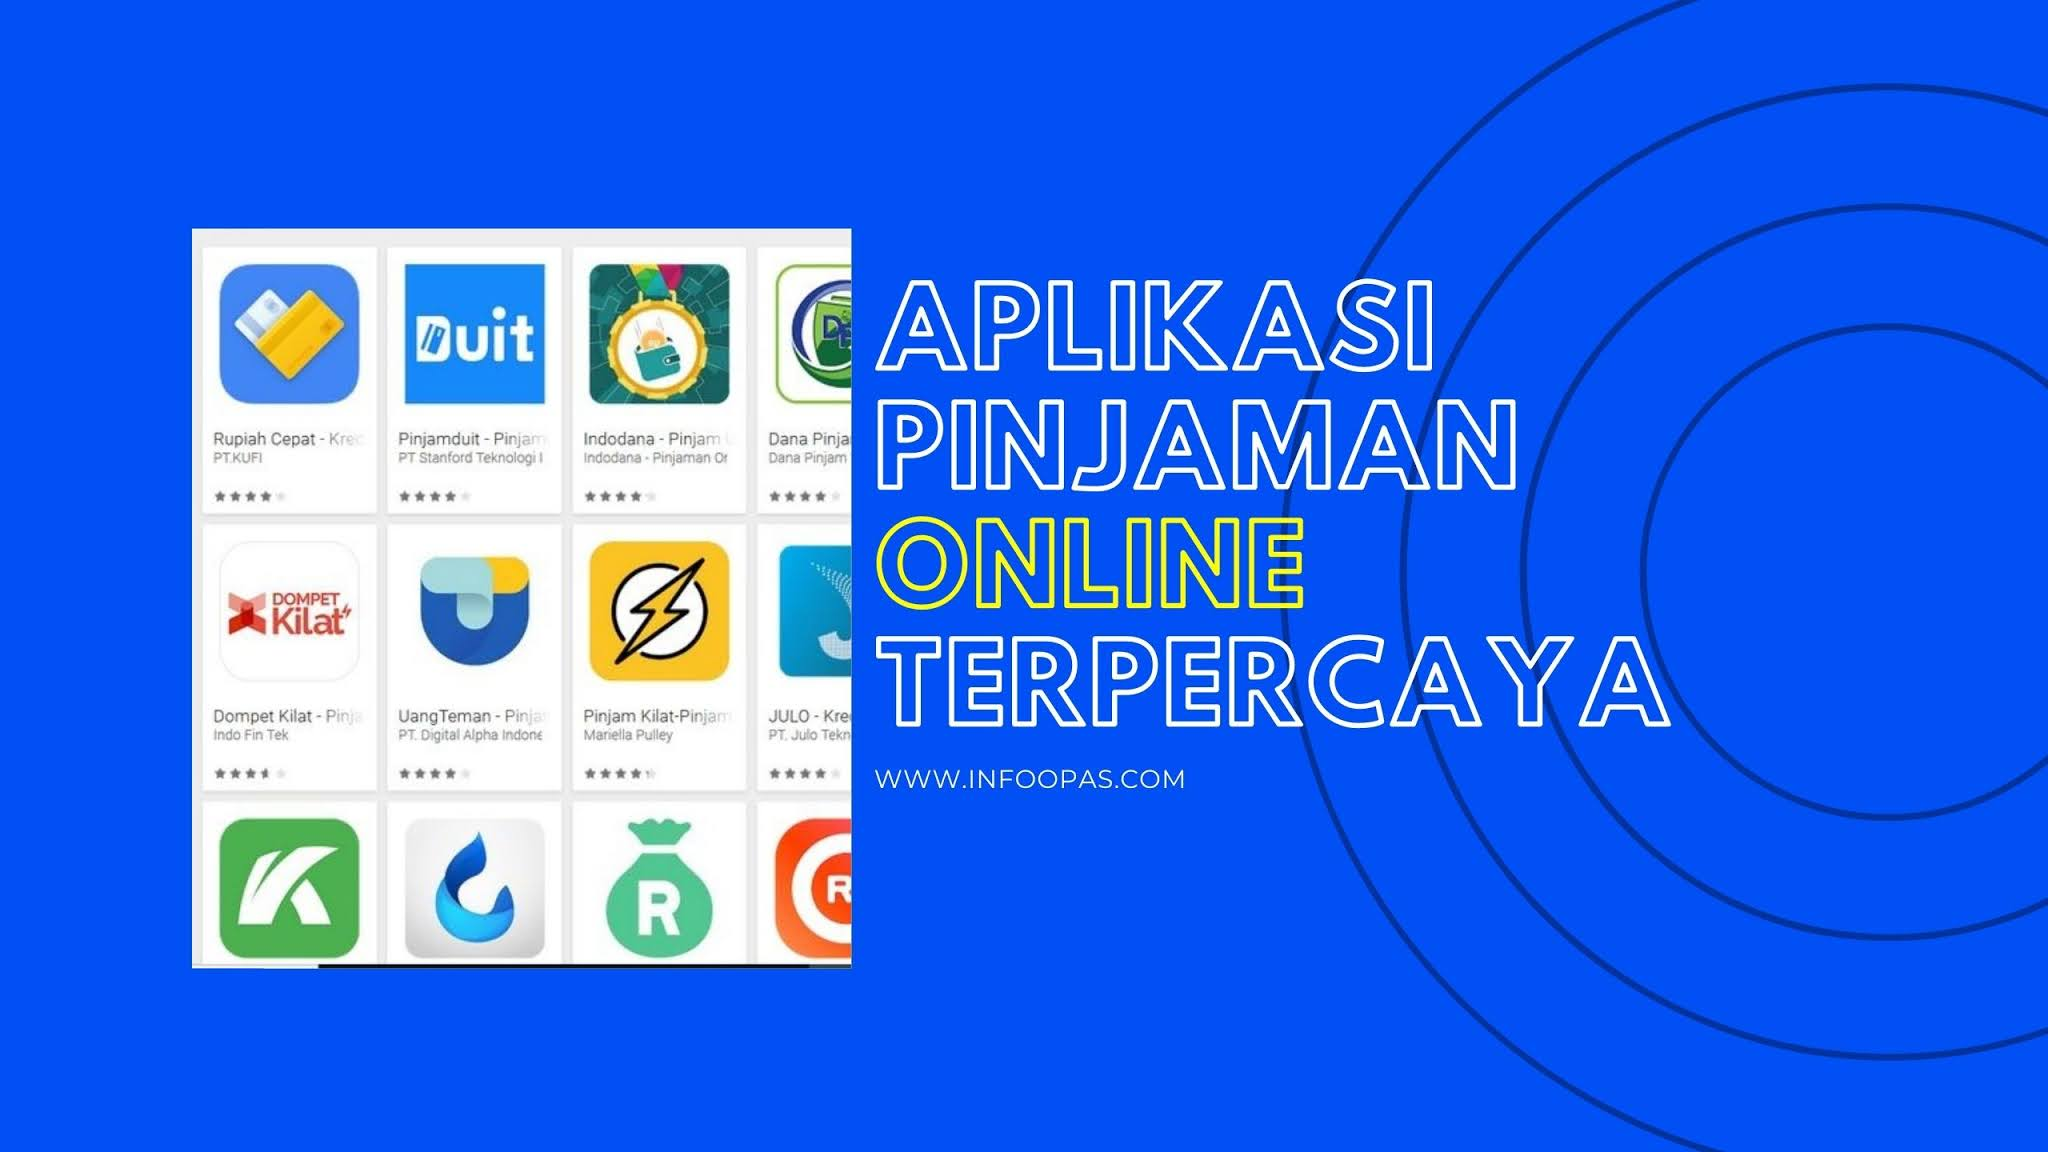 9 Rekomendasi Aplikasi Pinjaman Online Terpecaya Syarat Mudah Modal Ktp Infoopas Com